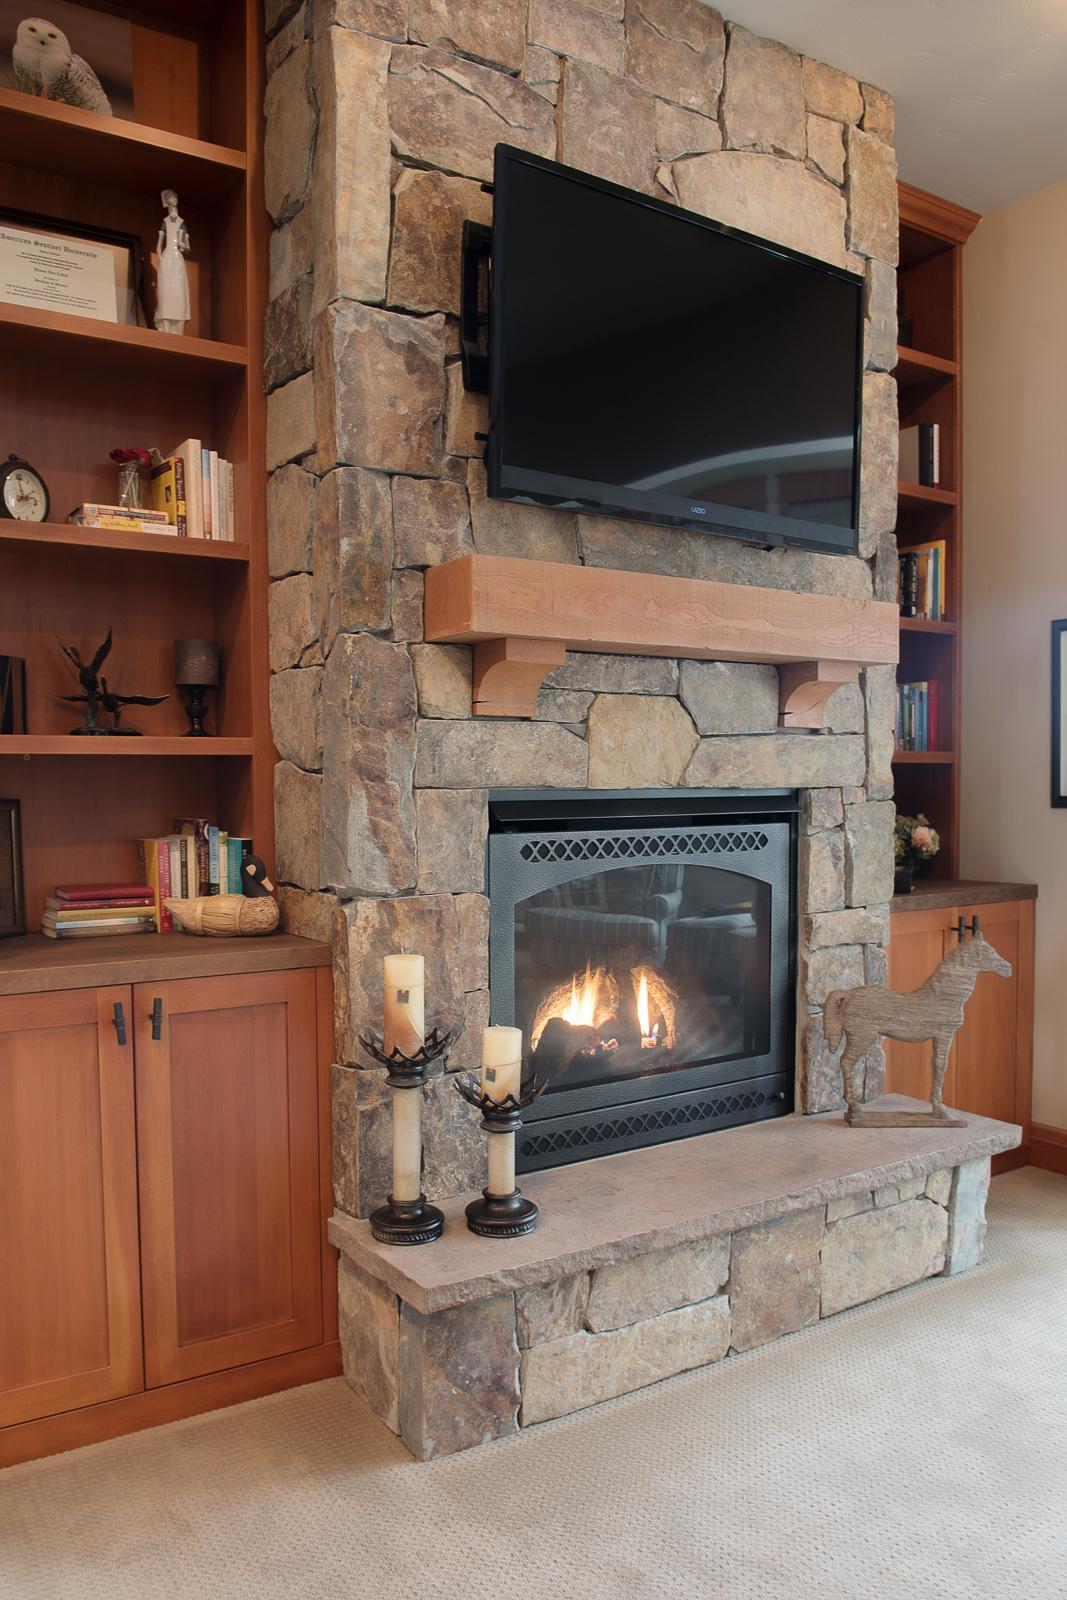 Woodworks-West-Bozeman-Montana-Builder-Cabinetry-Remodel-New-Construction-3584.jpg